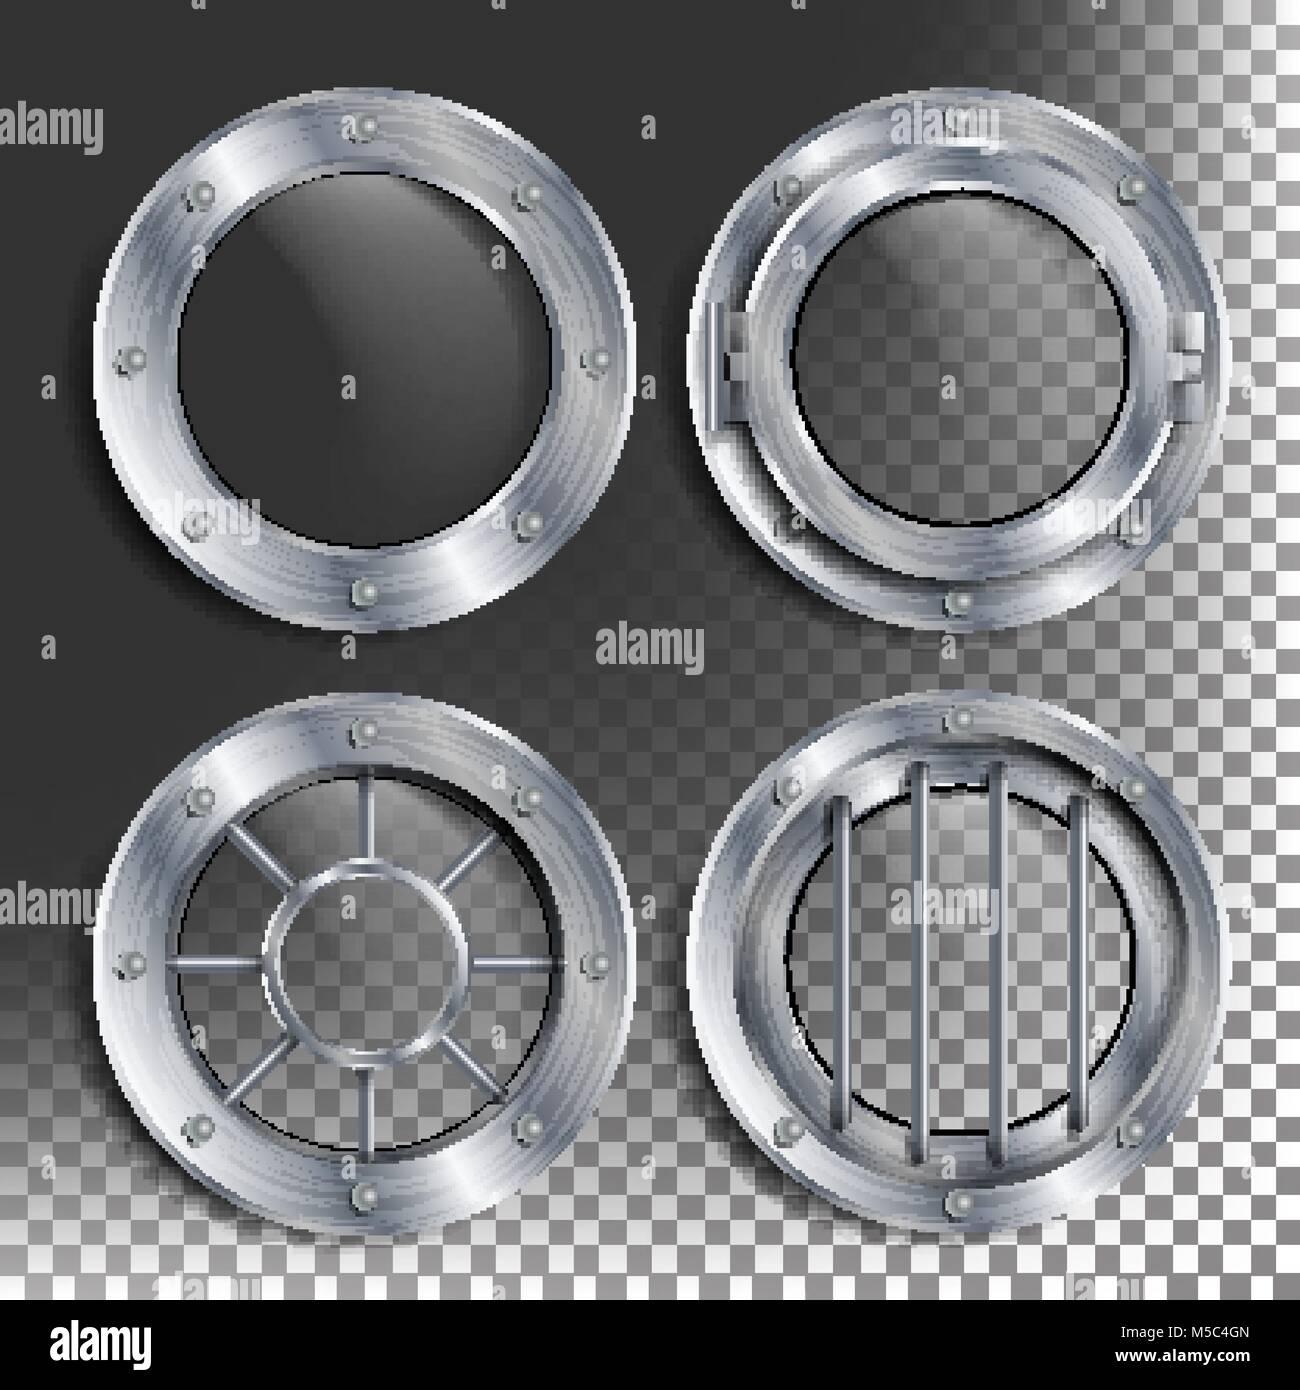 Silber Bullauge Vektor Runde Metall Fenster Mit Nieten Bathyscaph